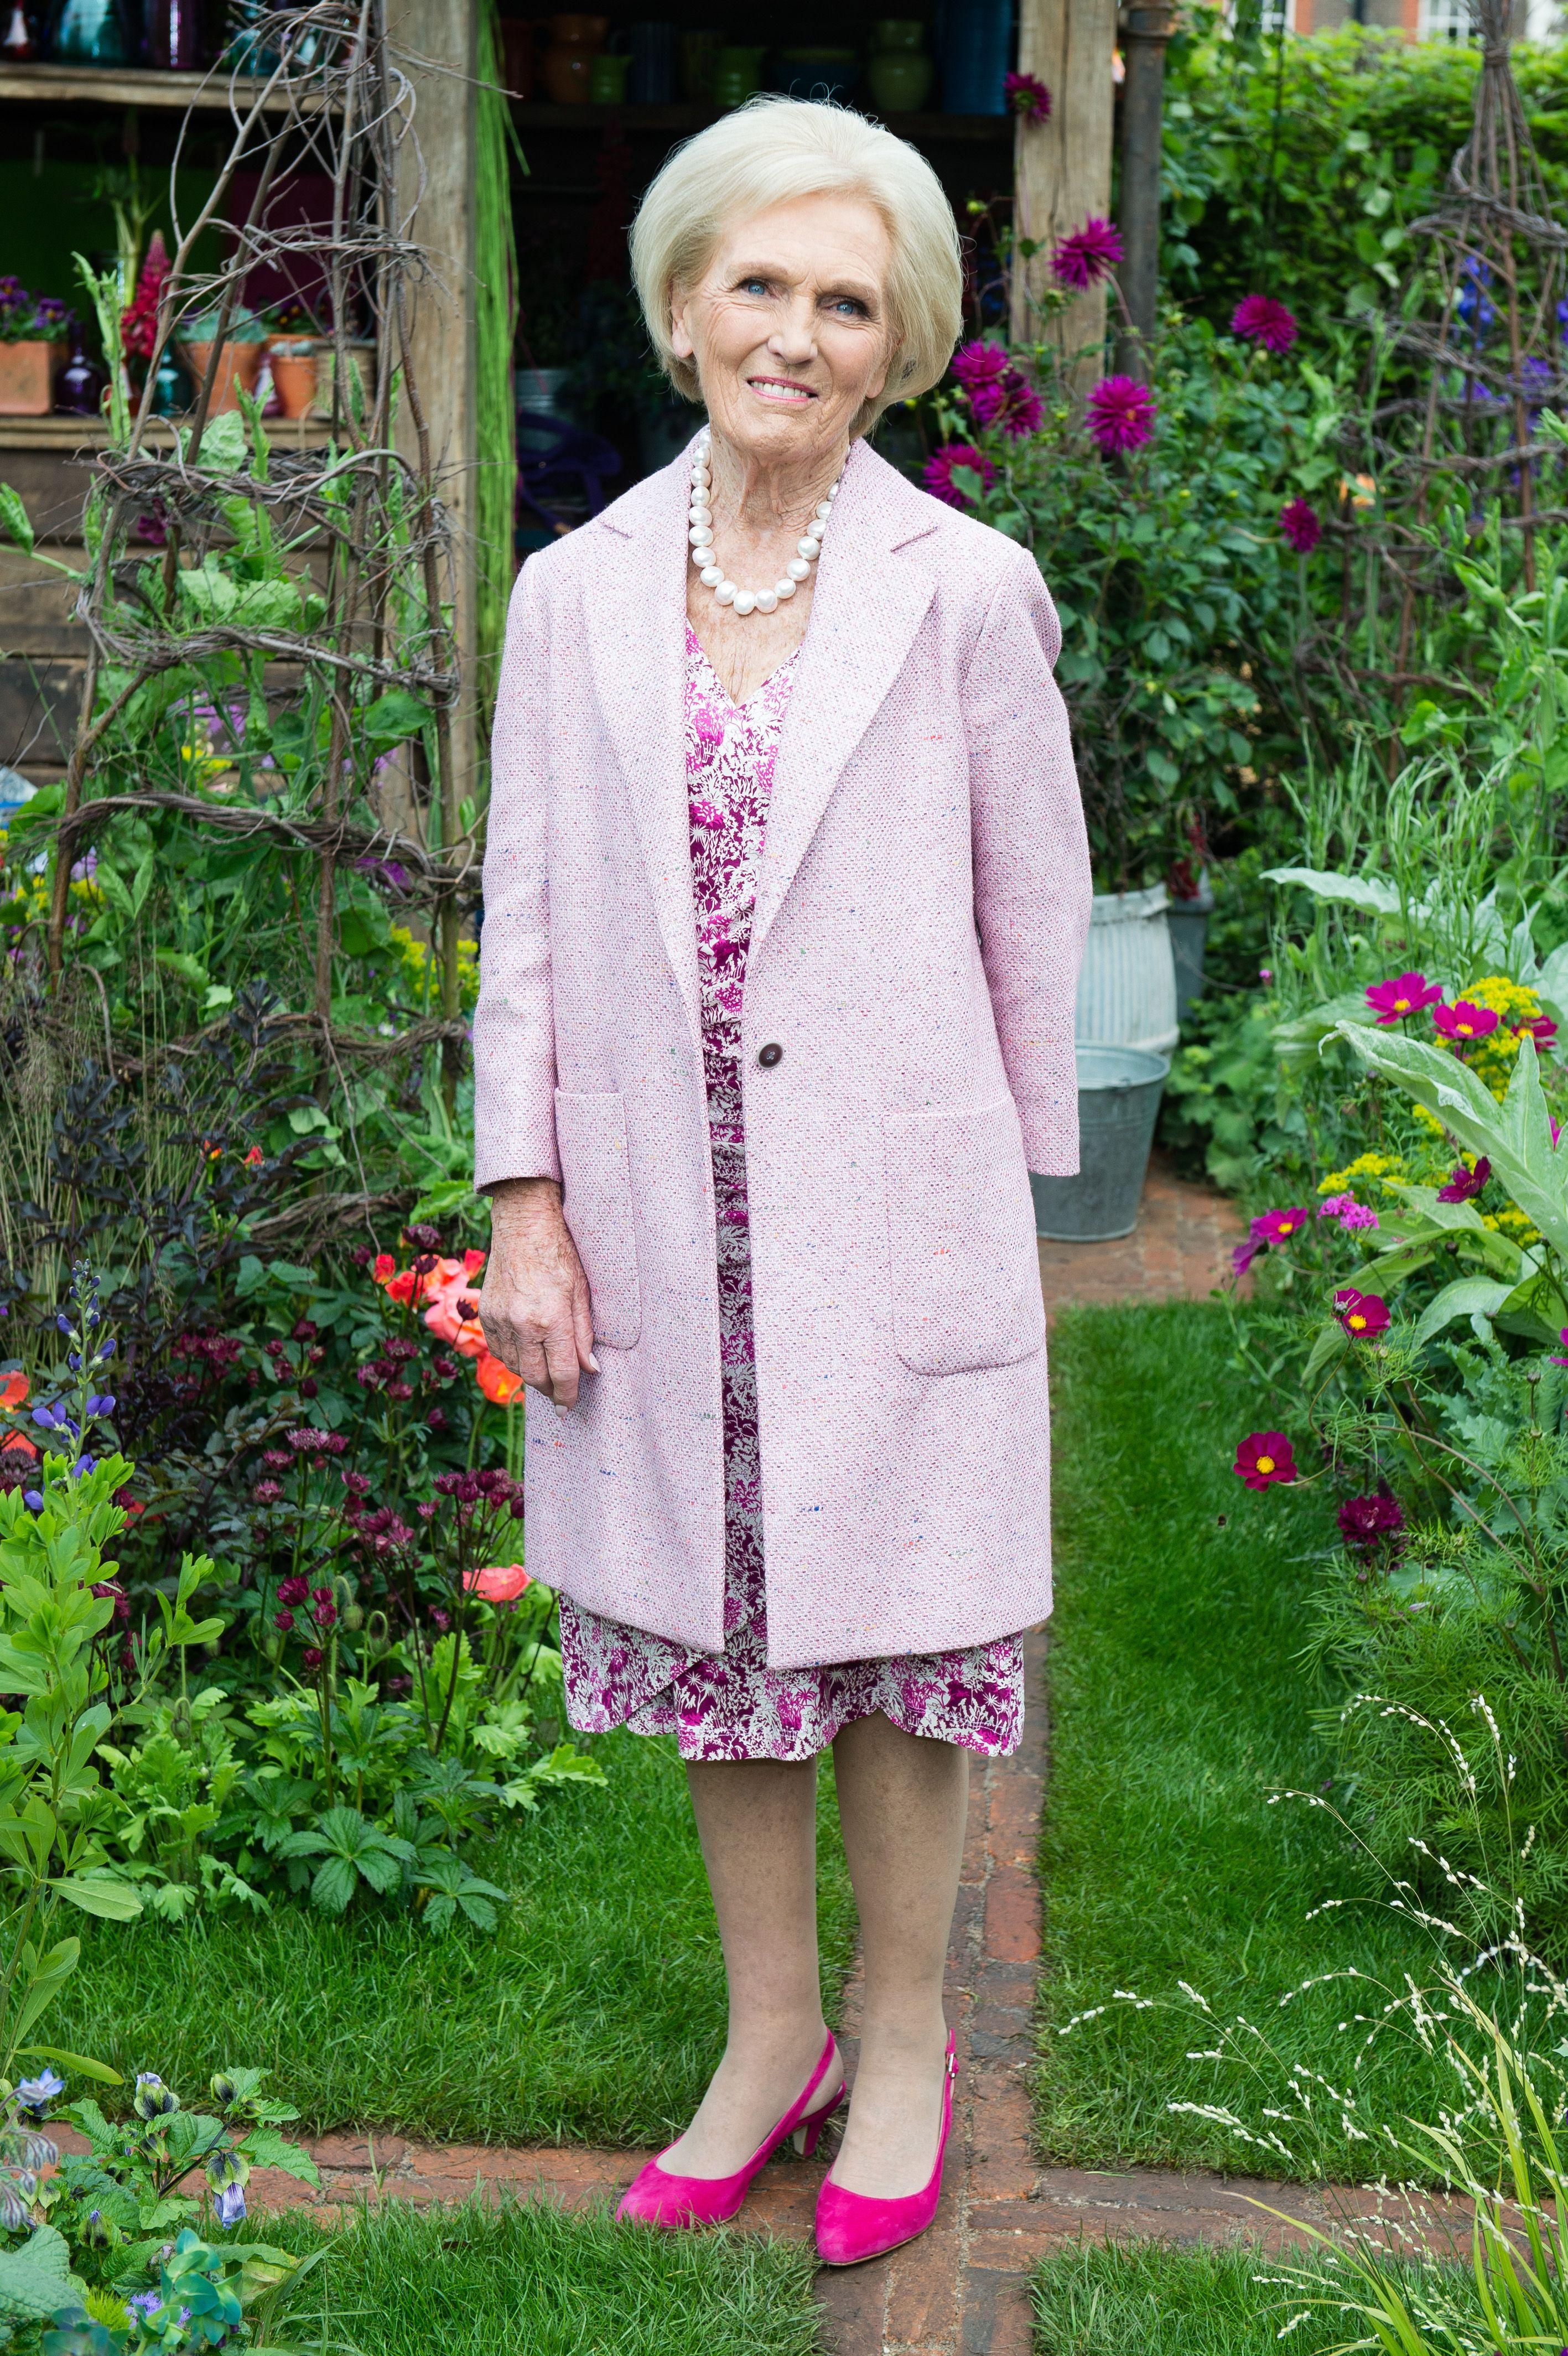 Rhs Chelsea Flower Show 2018 Mary Berry Jennifer Saunders Nick